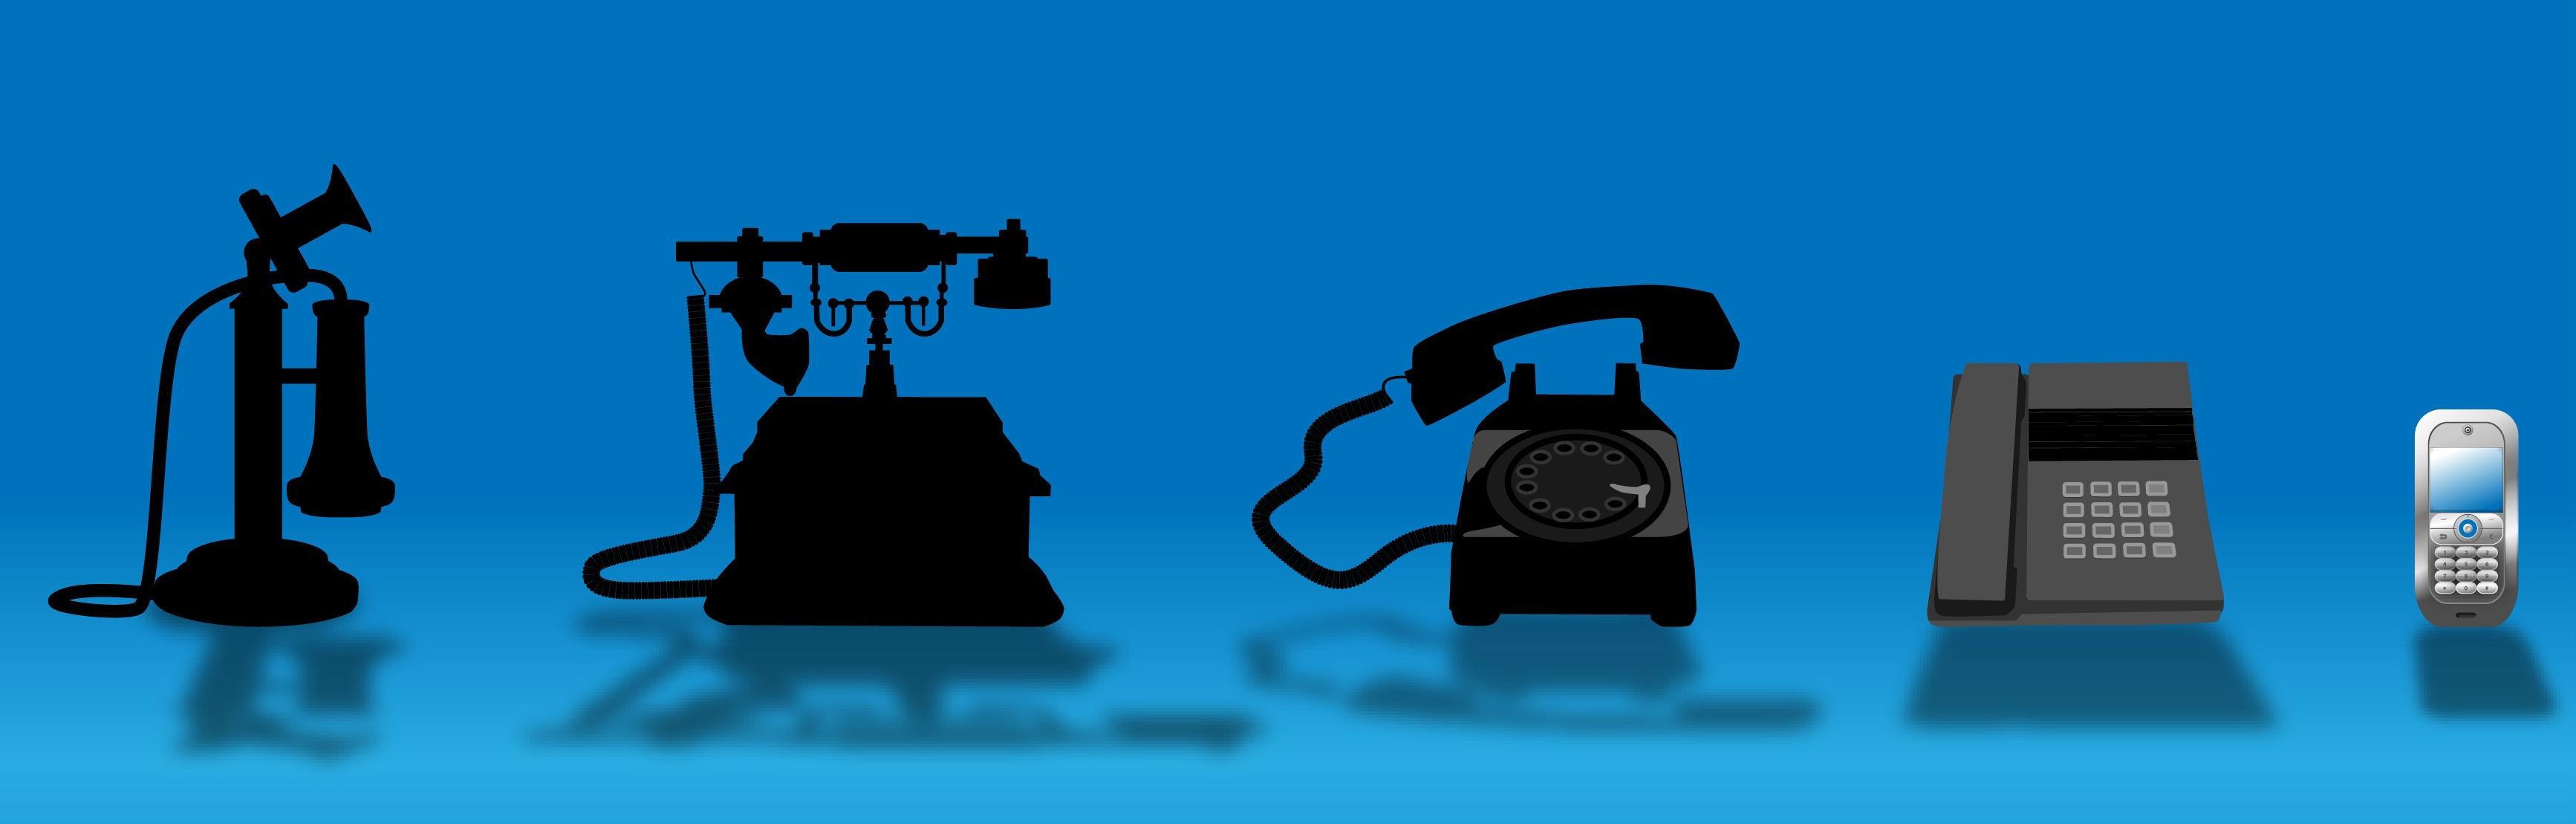 phone evolution.jpg